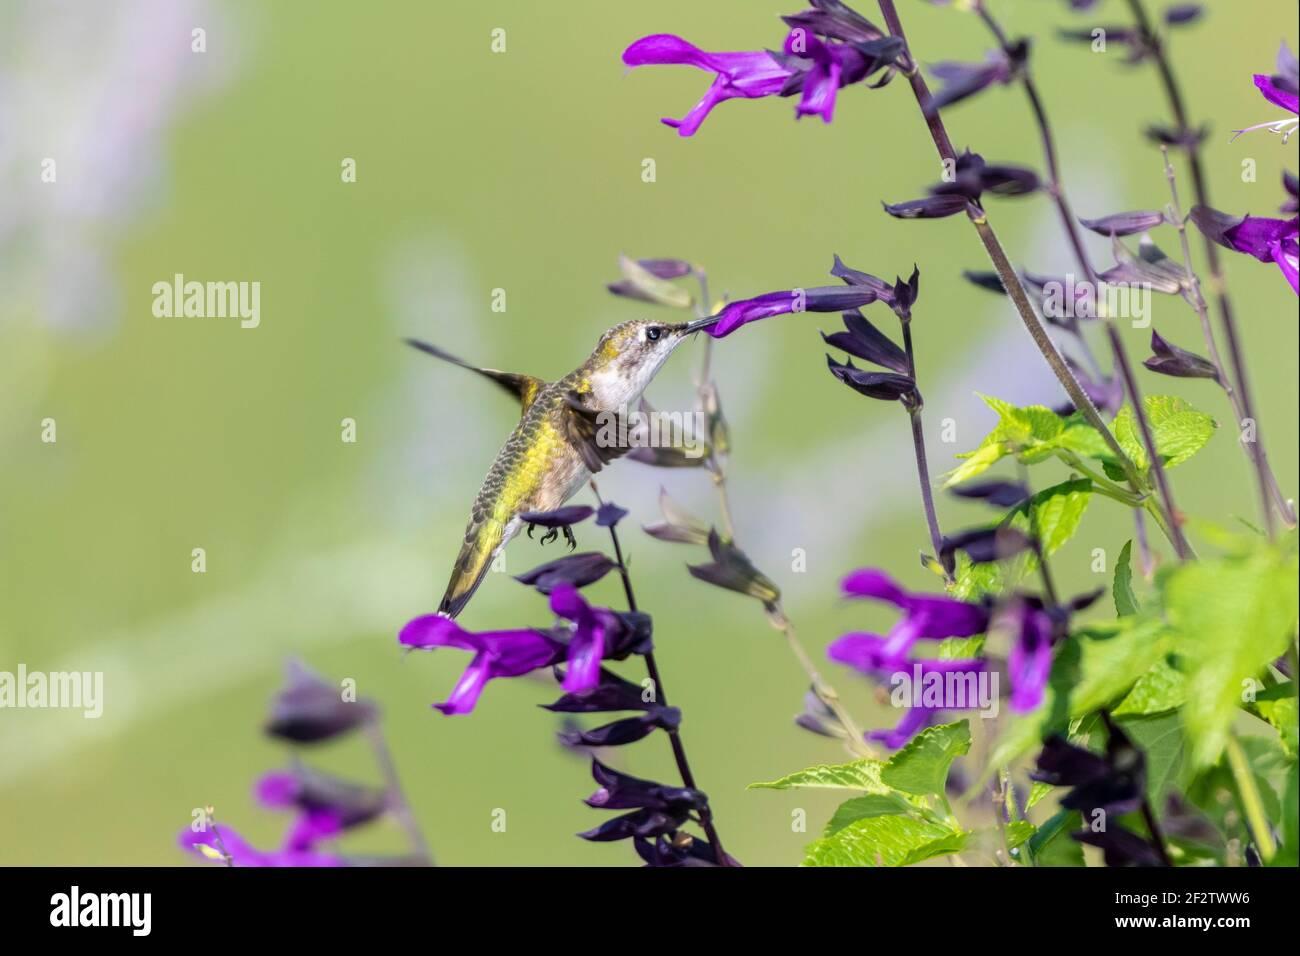 01162-16405 Hummingbird de garganta rubí (Archilochus colubris) en Salvia 'Purple and Bloom' (Salvia guaranitica) Marion Co. IL Foto de stock